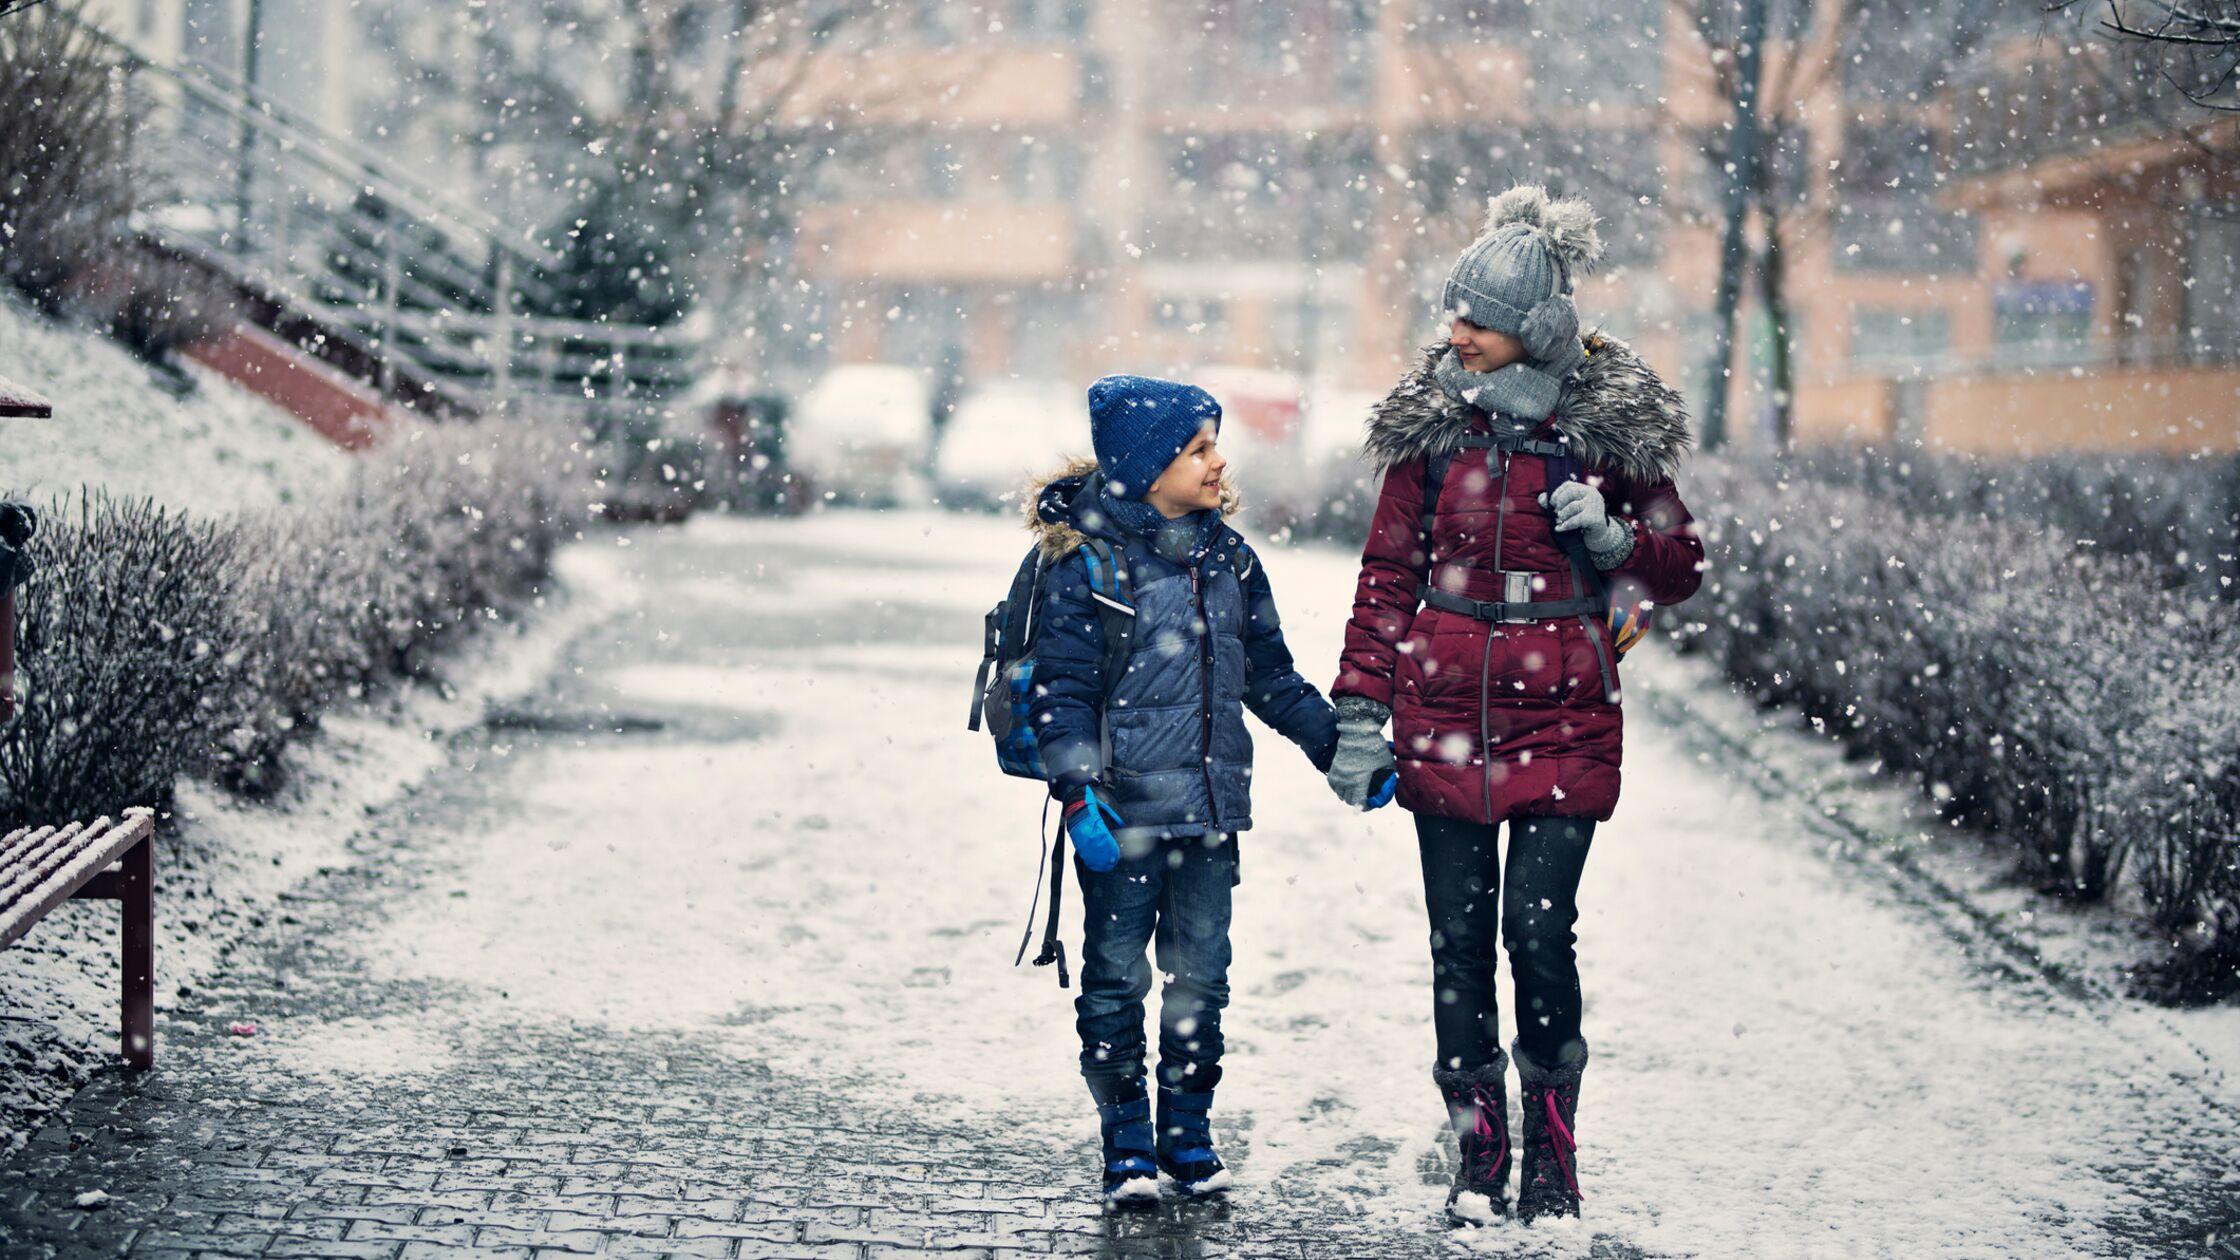 Geschwisterpaar spaziert im Winter über geräumten Gehweg